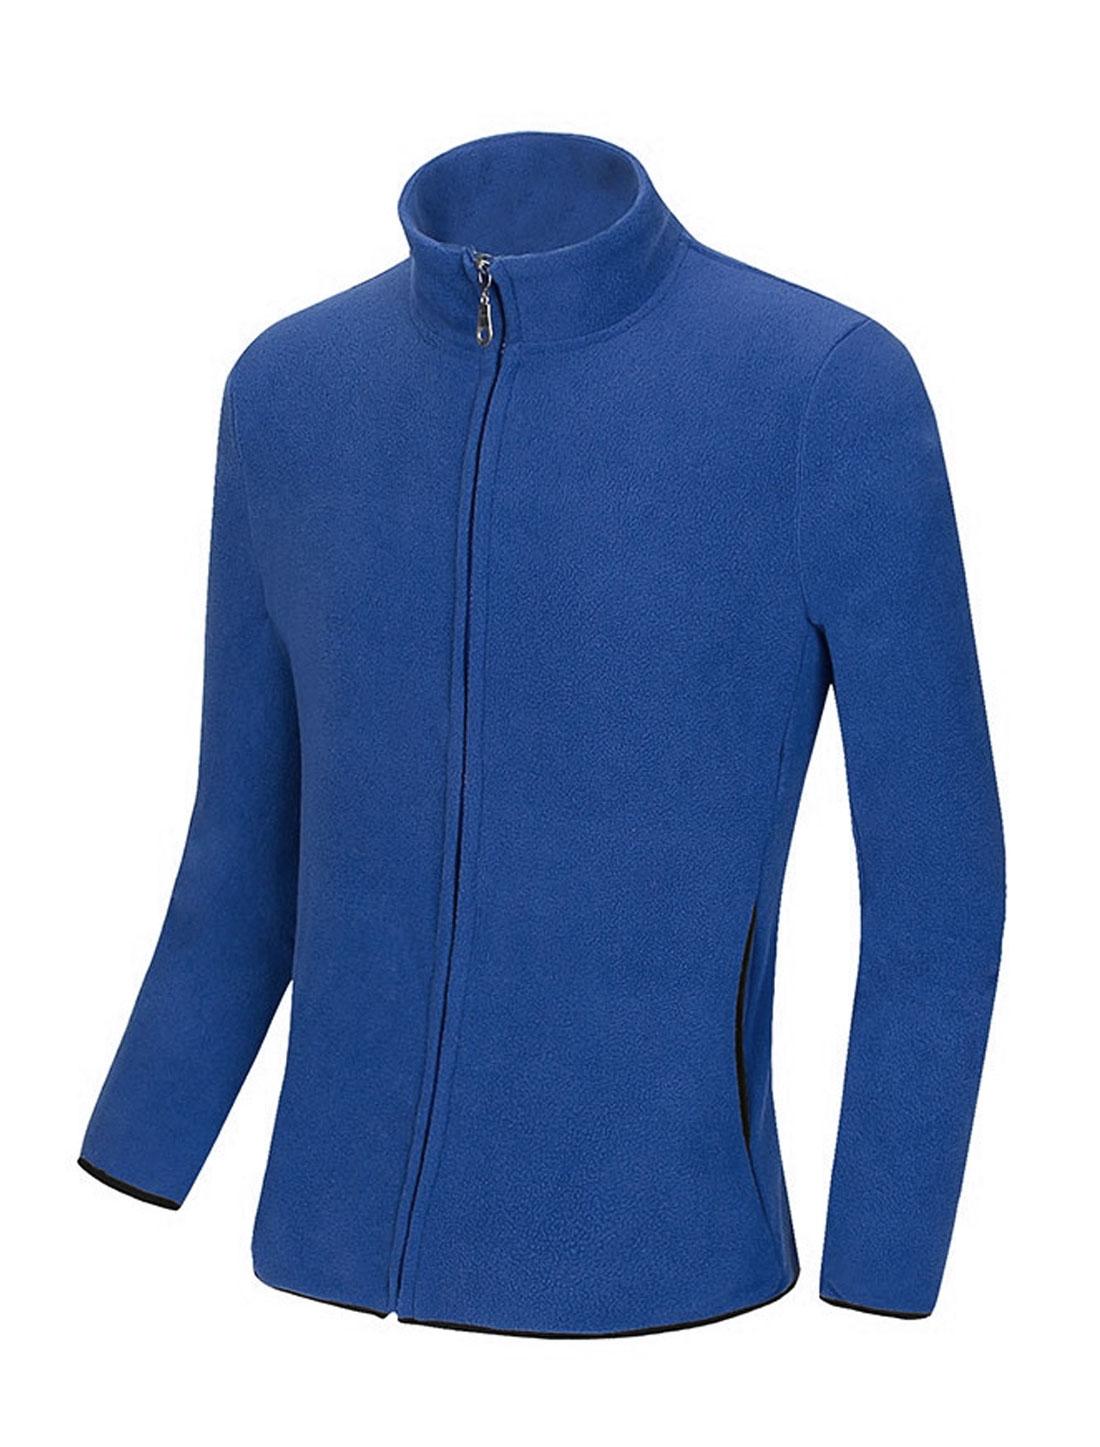 Men Long Sleeve Front Pockets Zip Up Fleece Jackets Royal Blue M